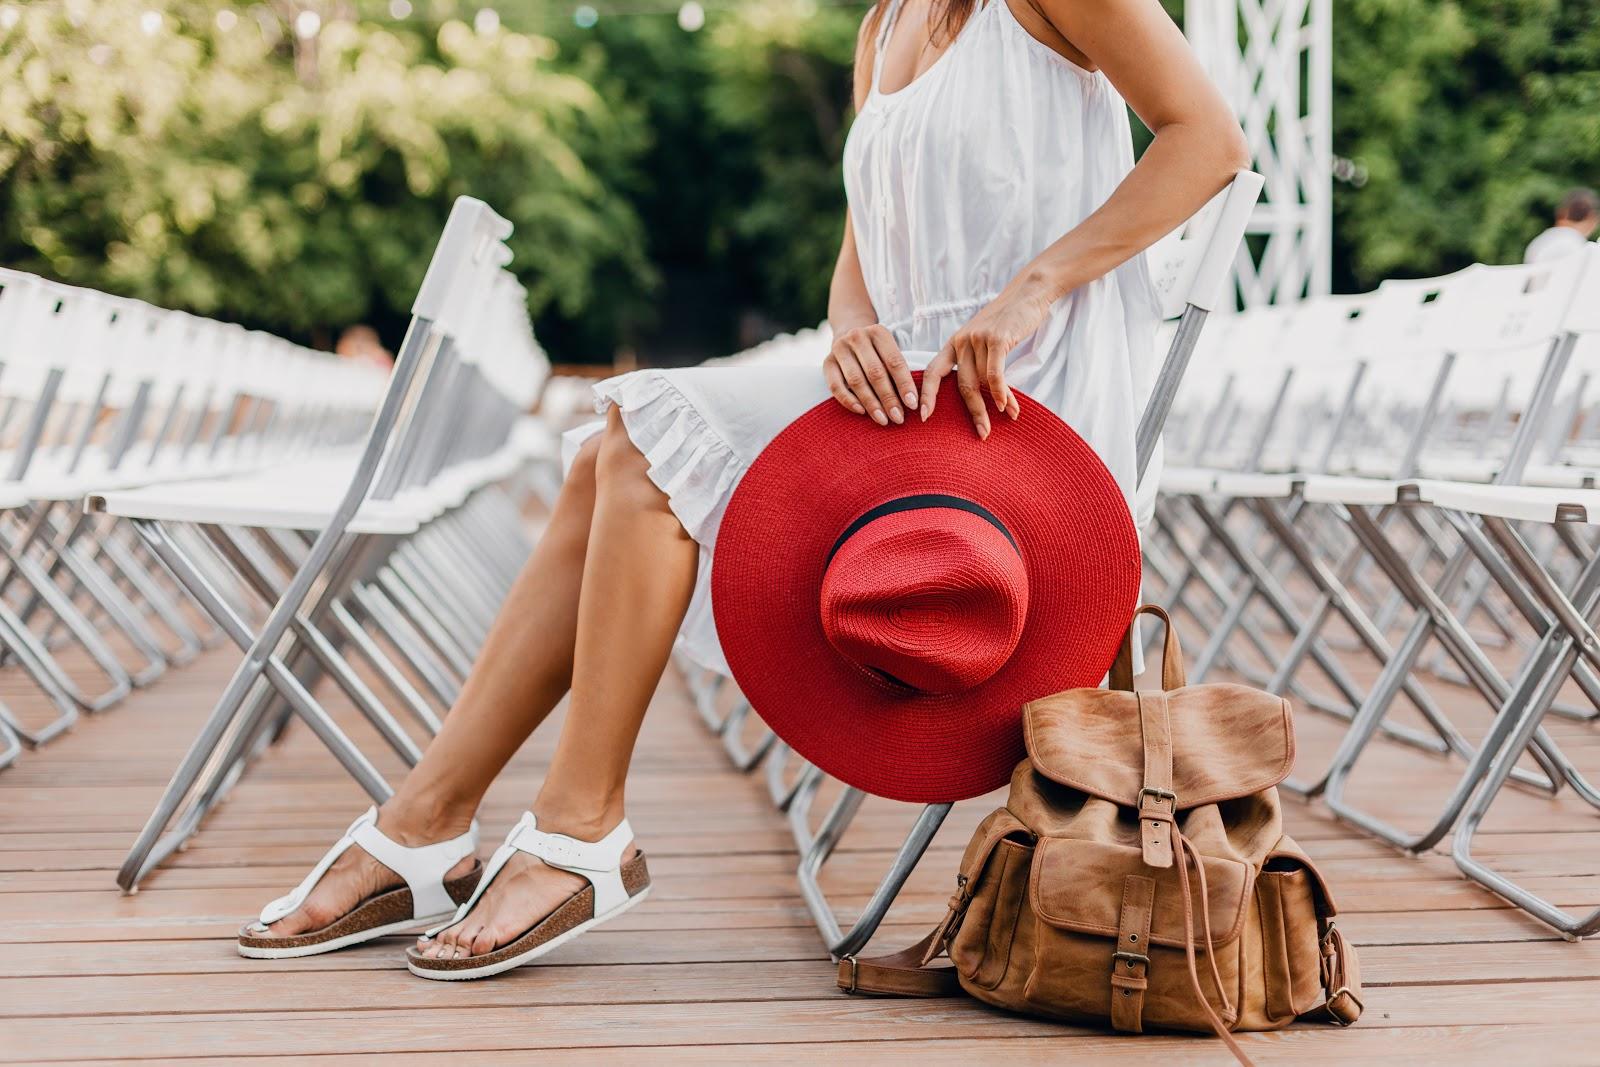 Womenswear Trends for Summer 2021